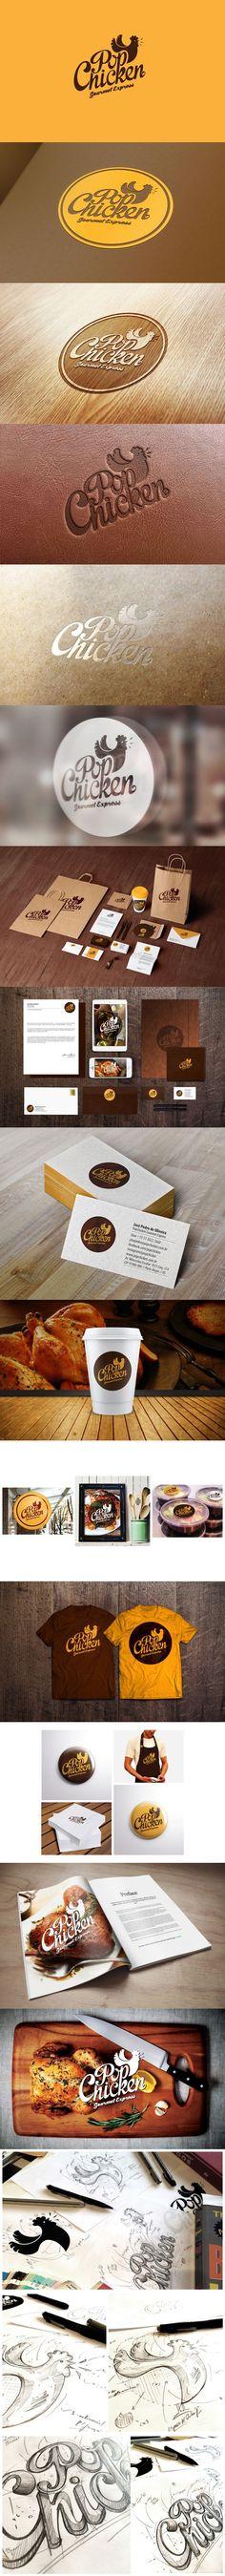 PopChicken Gourmet Express Logo and Branding